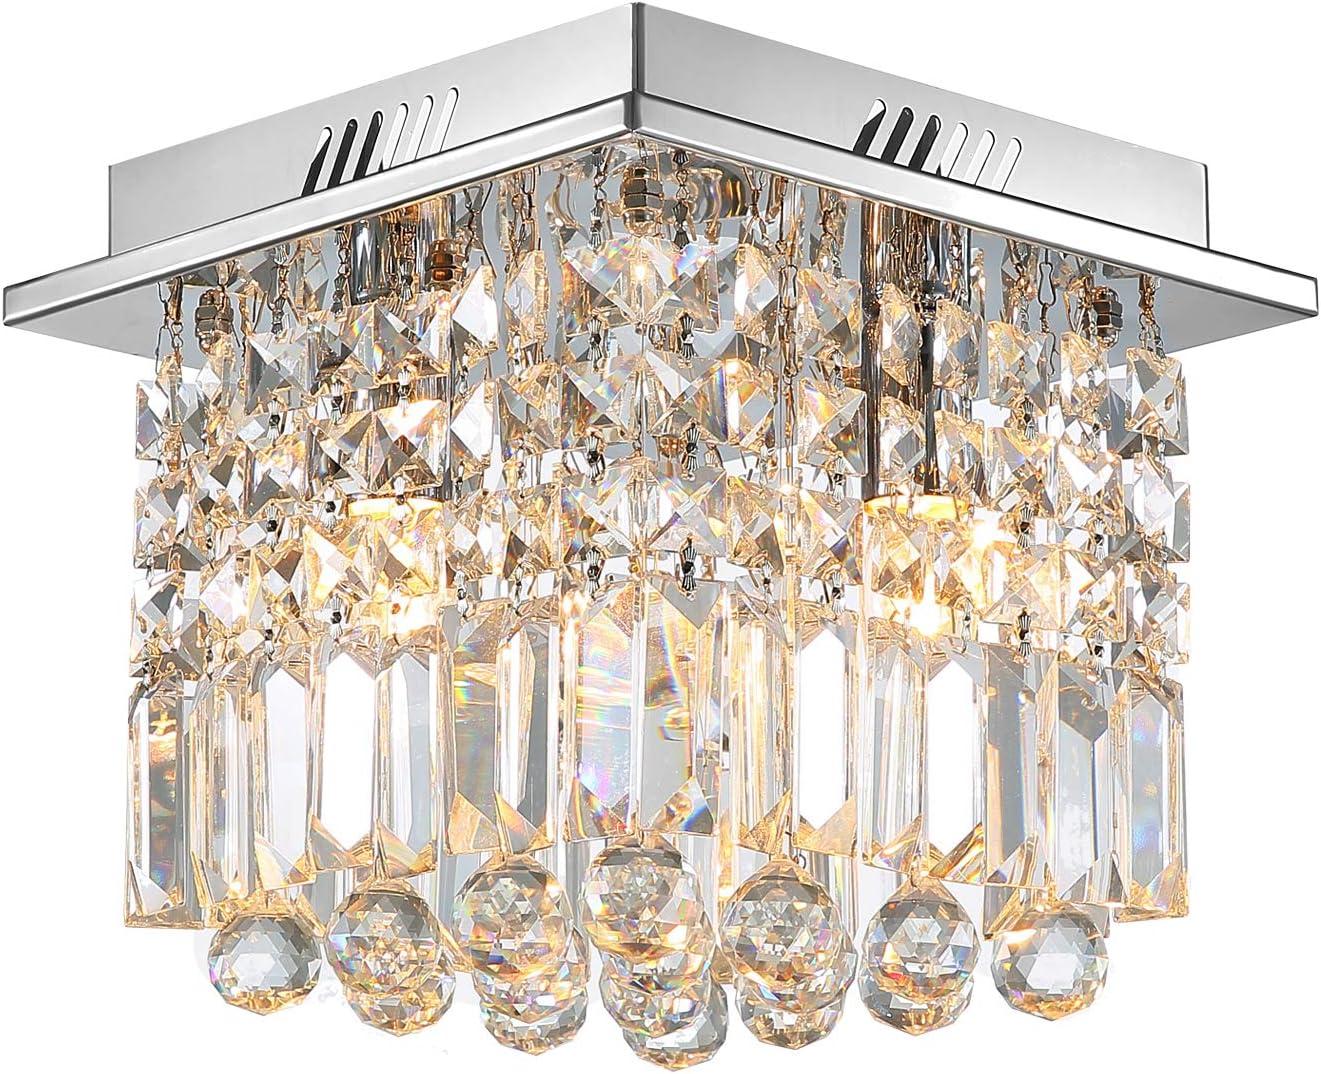 Crystal Ceiling Light Modern Square Chandelier Lighting for Hallway Entrance W10 x H10 Raindrop Design